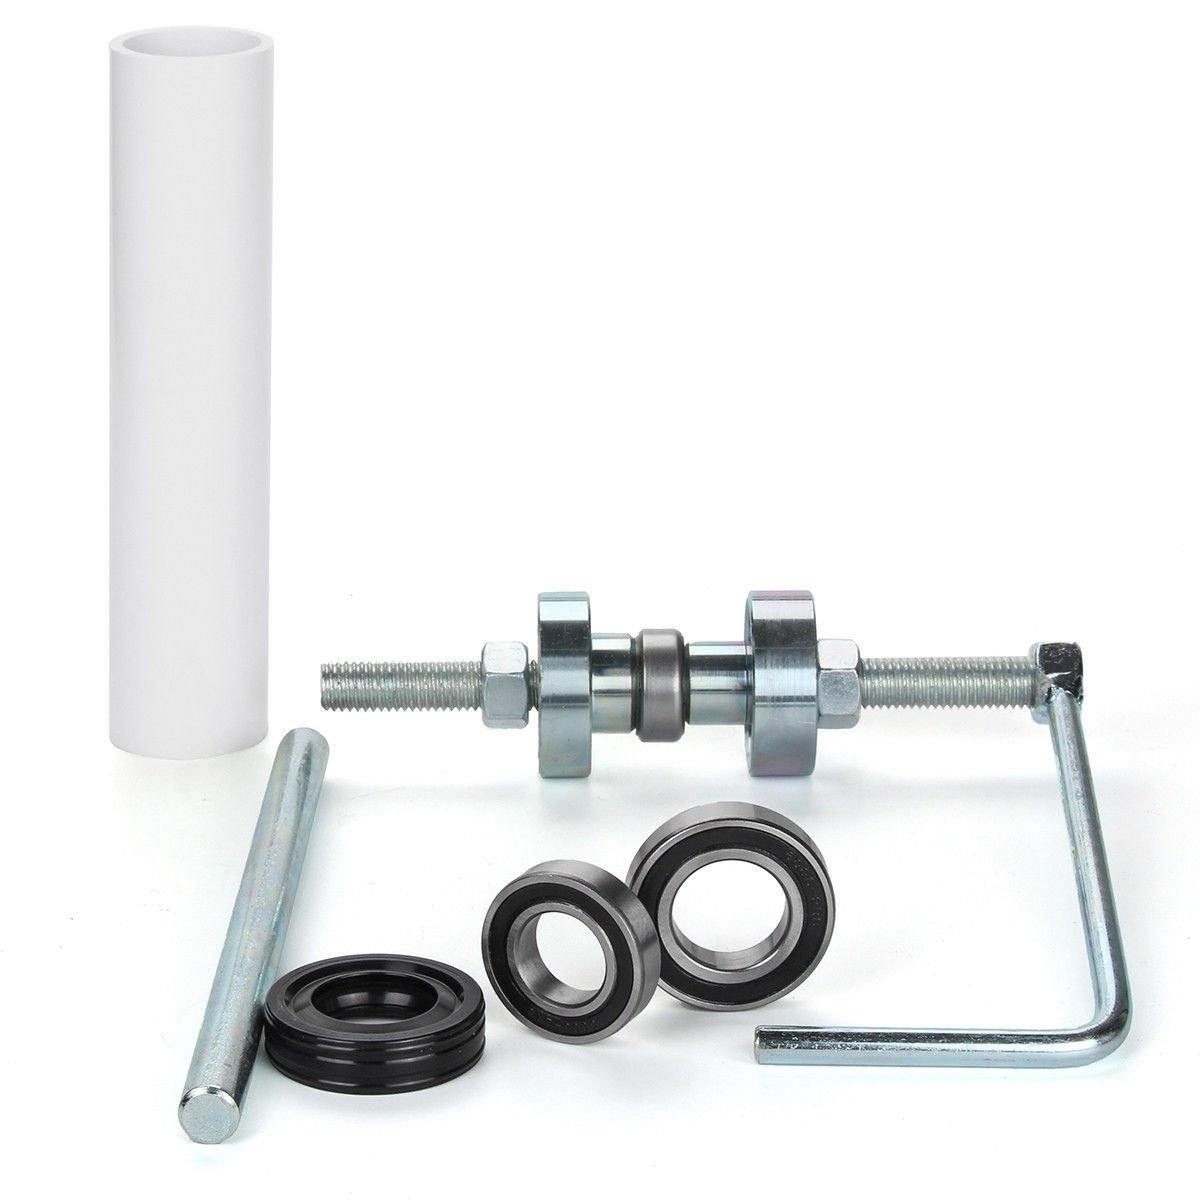 MAYITOP Bearing & Seal Install Tool For Maytag Whirlpool Cabrio Bravo W10447783 W10435302